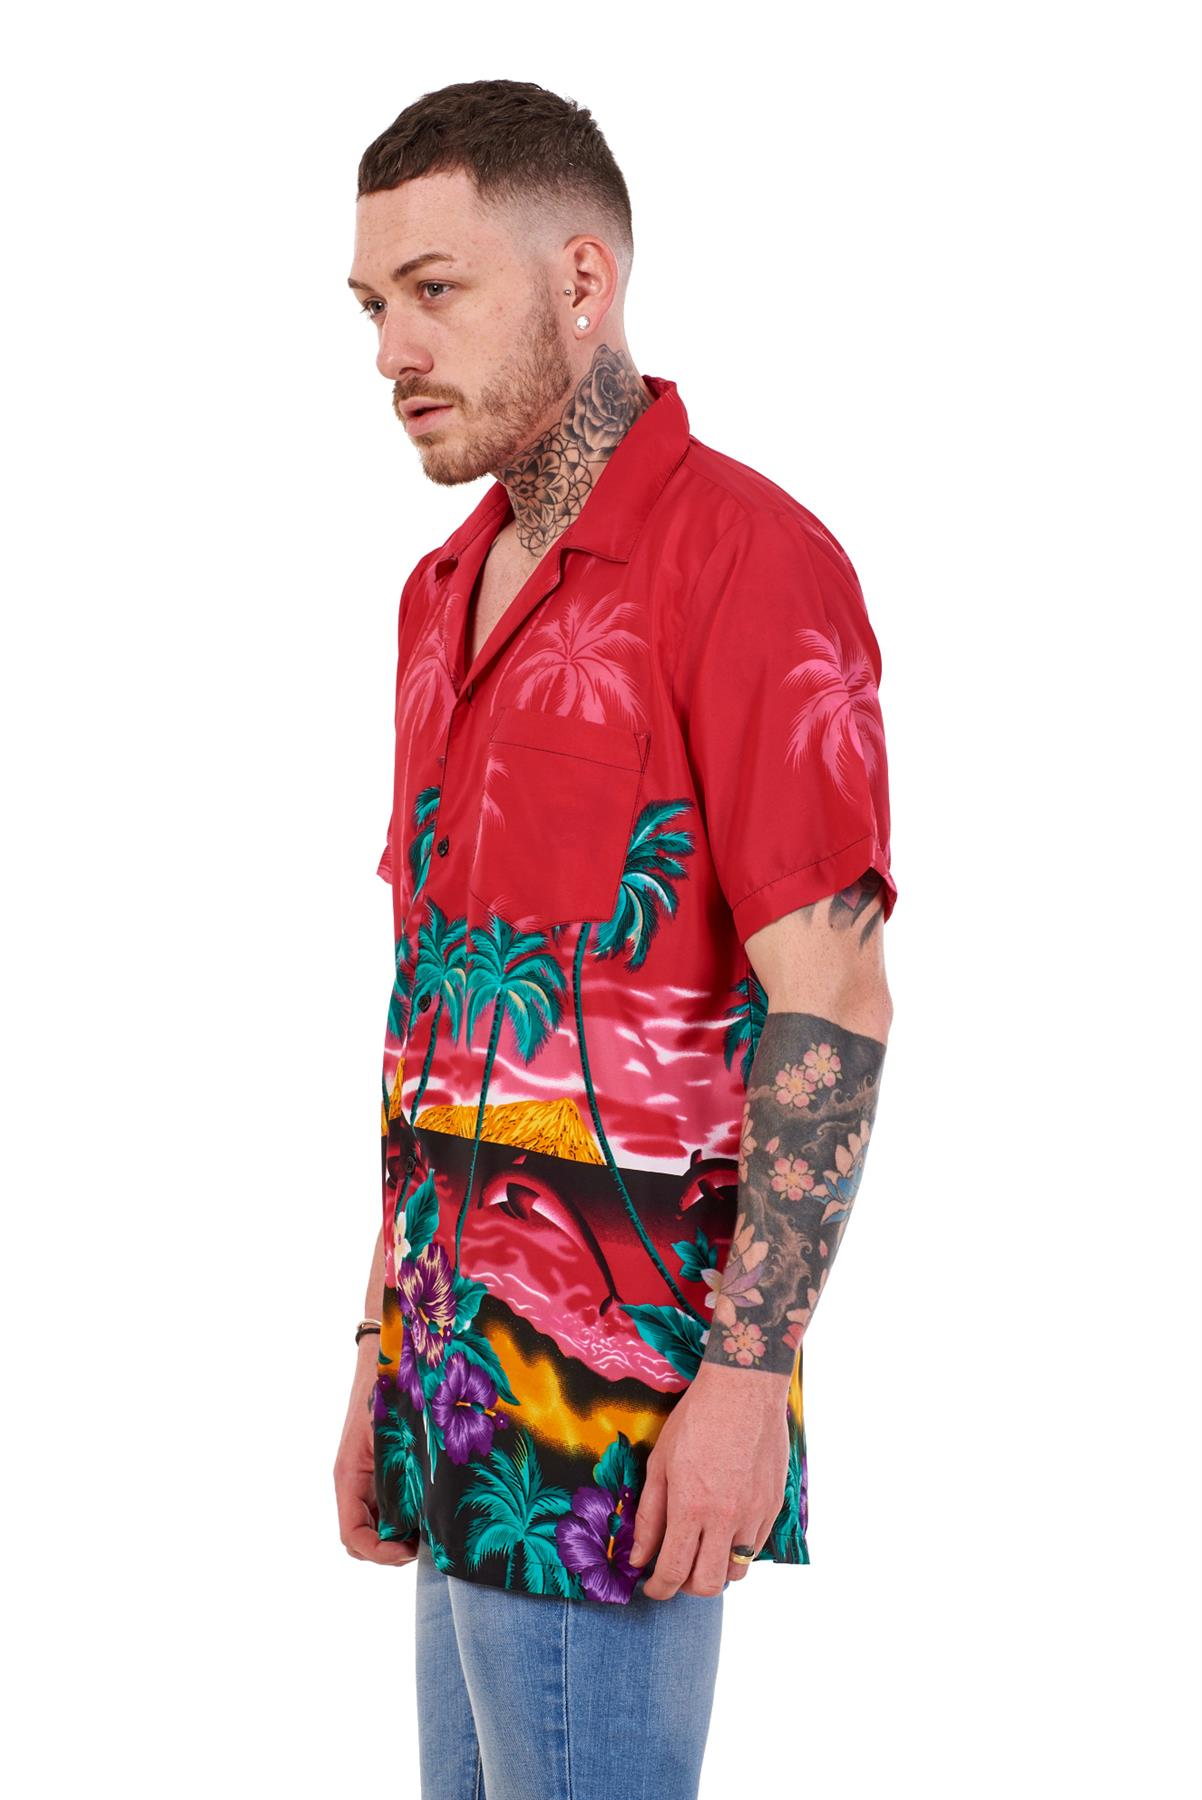 Mens-Hawaiian-Shirt-Multi-Colors-Print-Regular-Big-Size-Summer-Fancy-Dress-M-5XL thumbnail 14